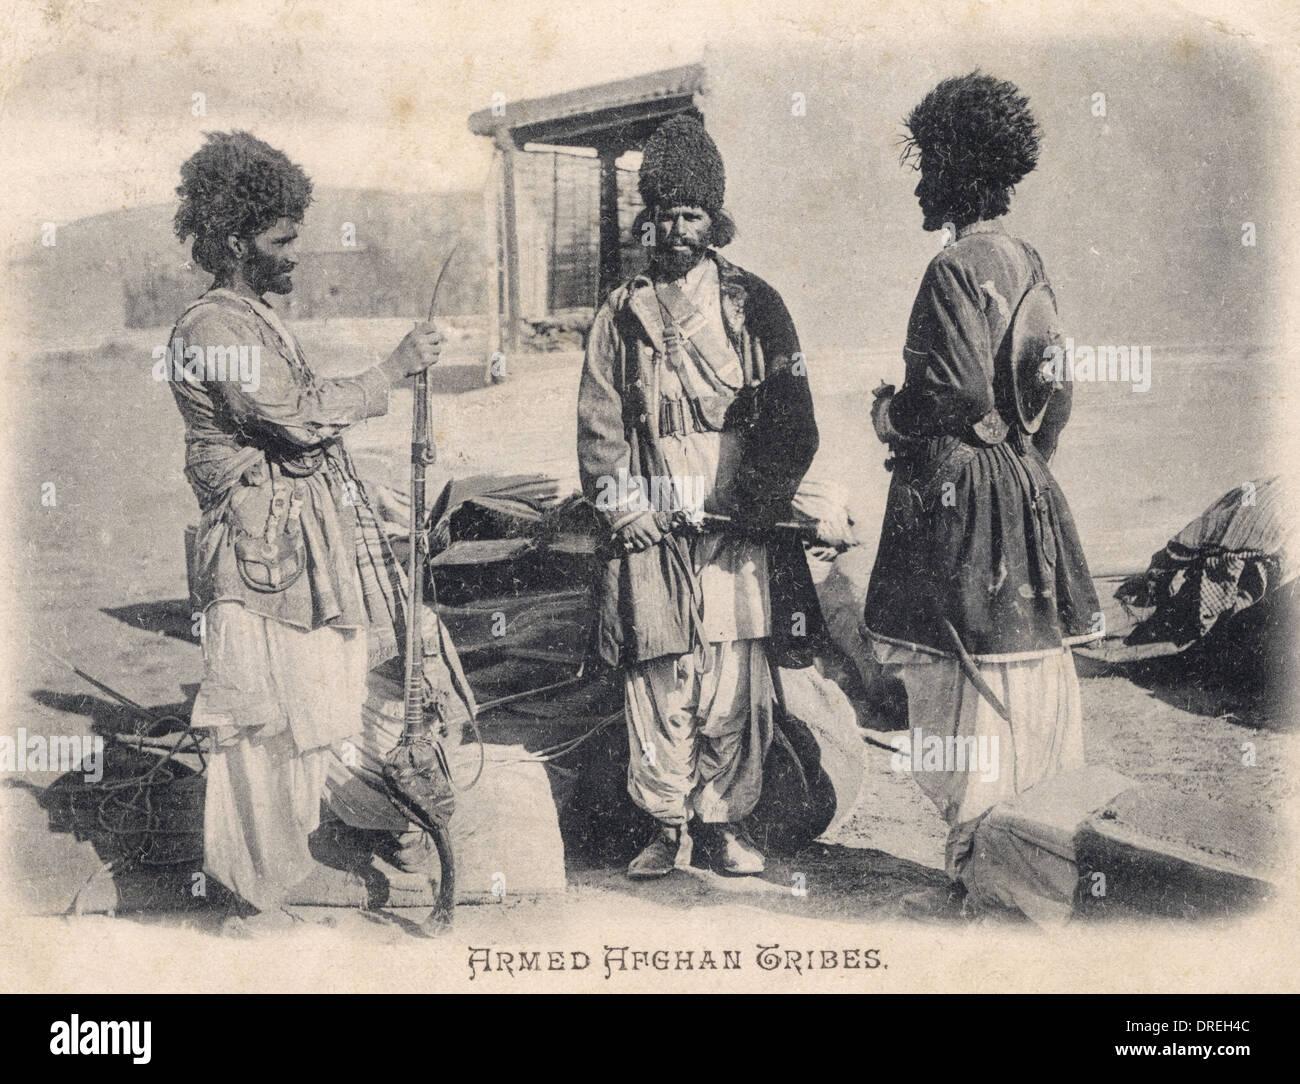 Armed Afghan Tribesmen - Stock Image